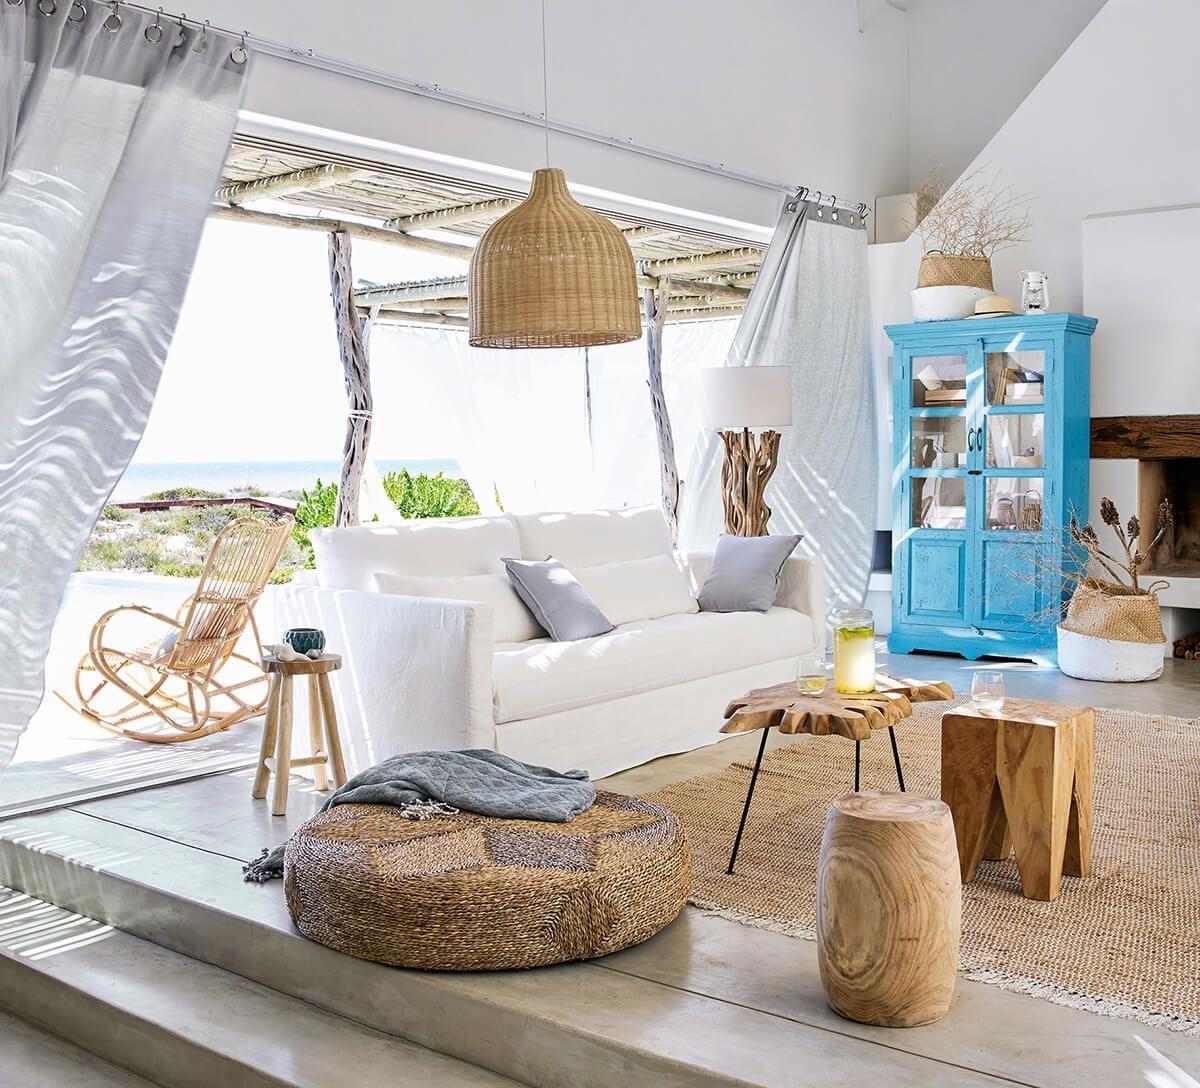 Ambiance Bord De Mer Chic shopping pour une ambiance style maison de vacances (frenchy